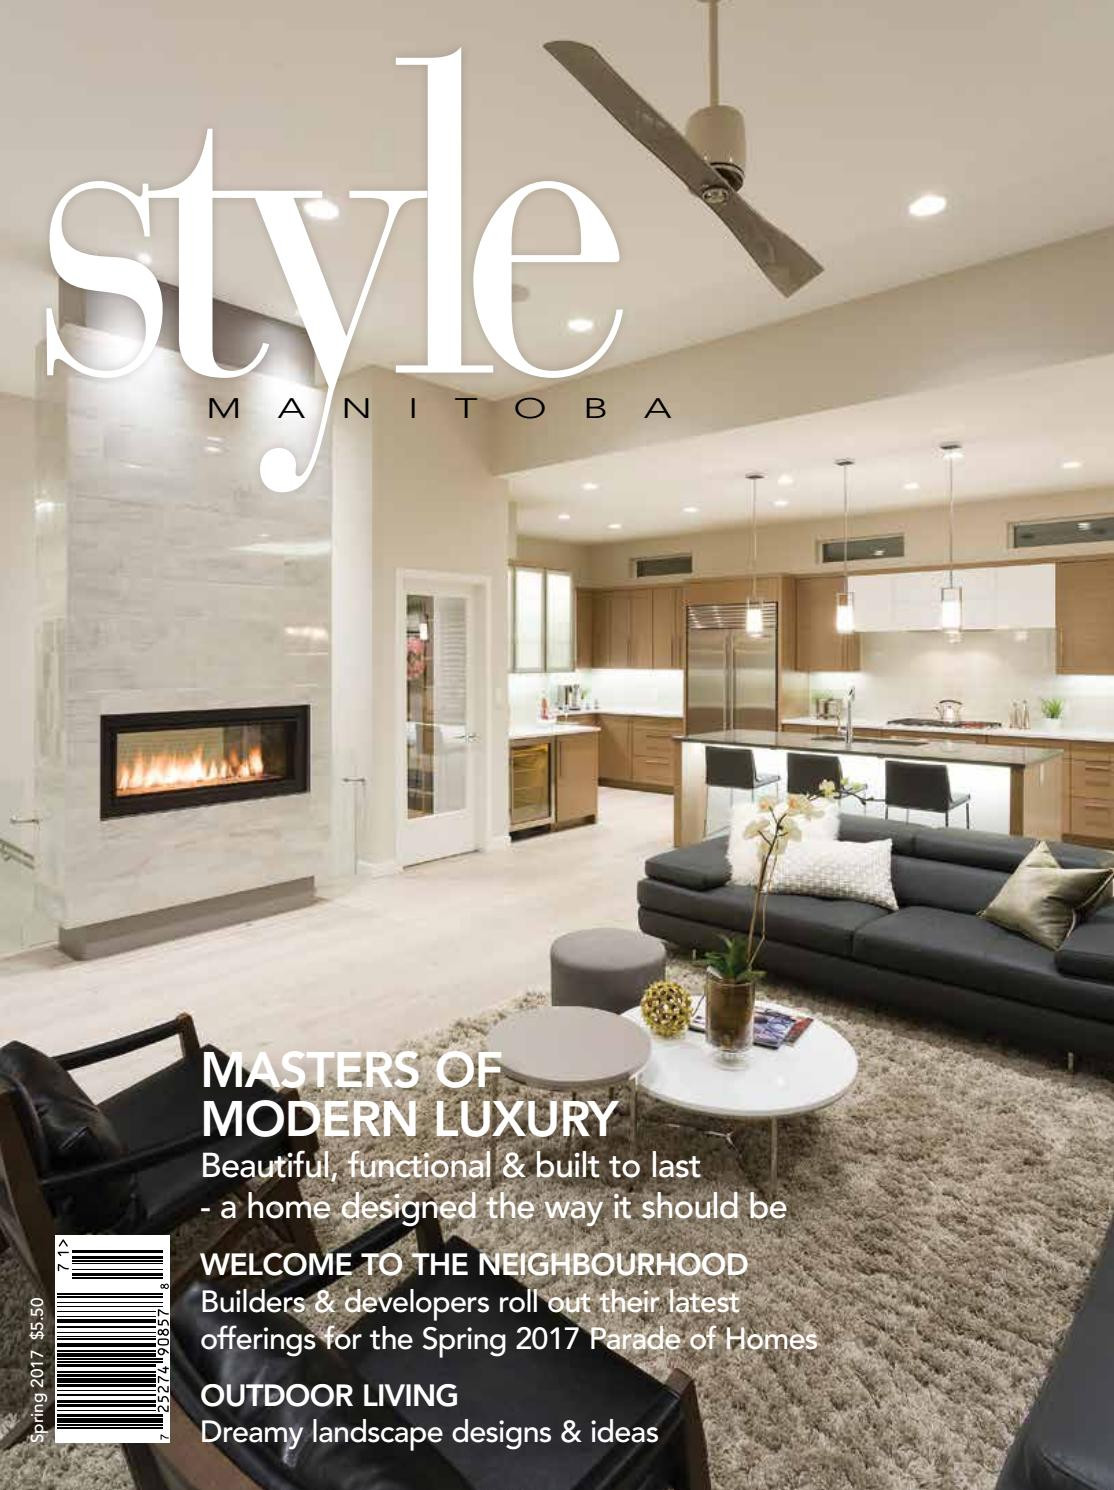 cost of refinishing hardwood floors winnipeg of style manitoba spring 2017 by style manitoba issuu pertaining to page 1